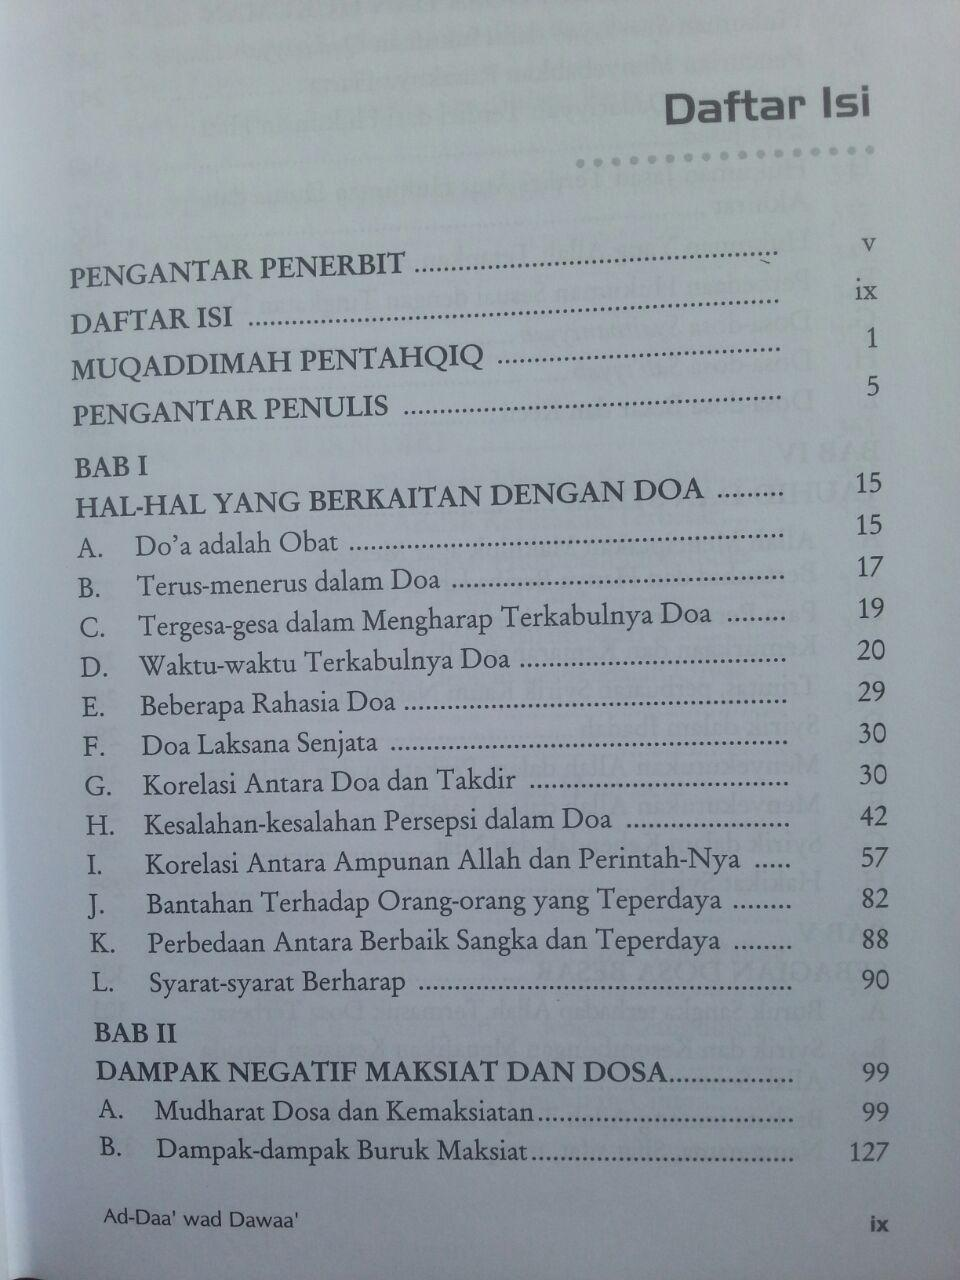 Buku Pengobatan Ad-Daa' wa ad-Dawaa' isi 2